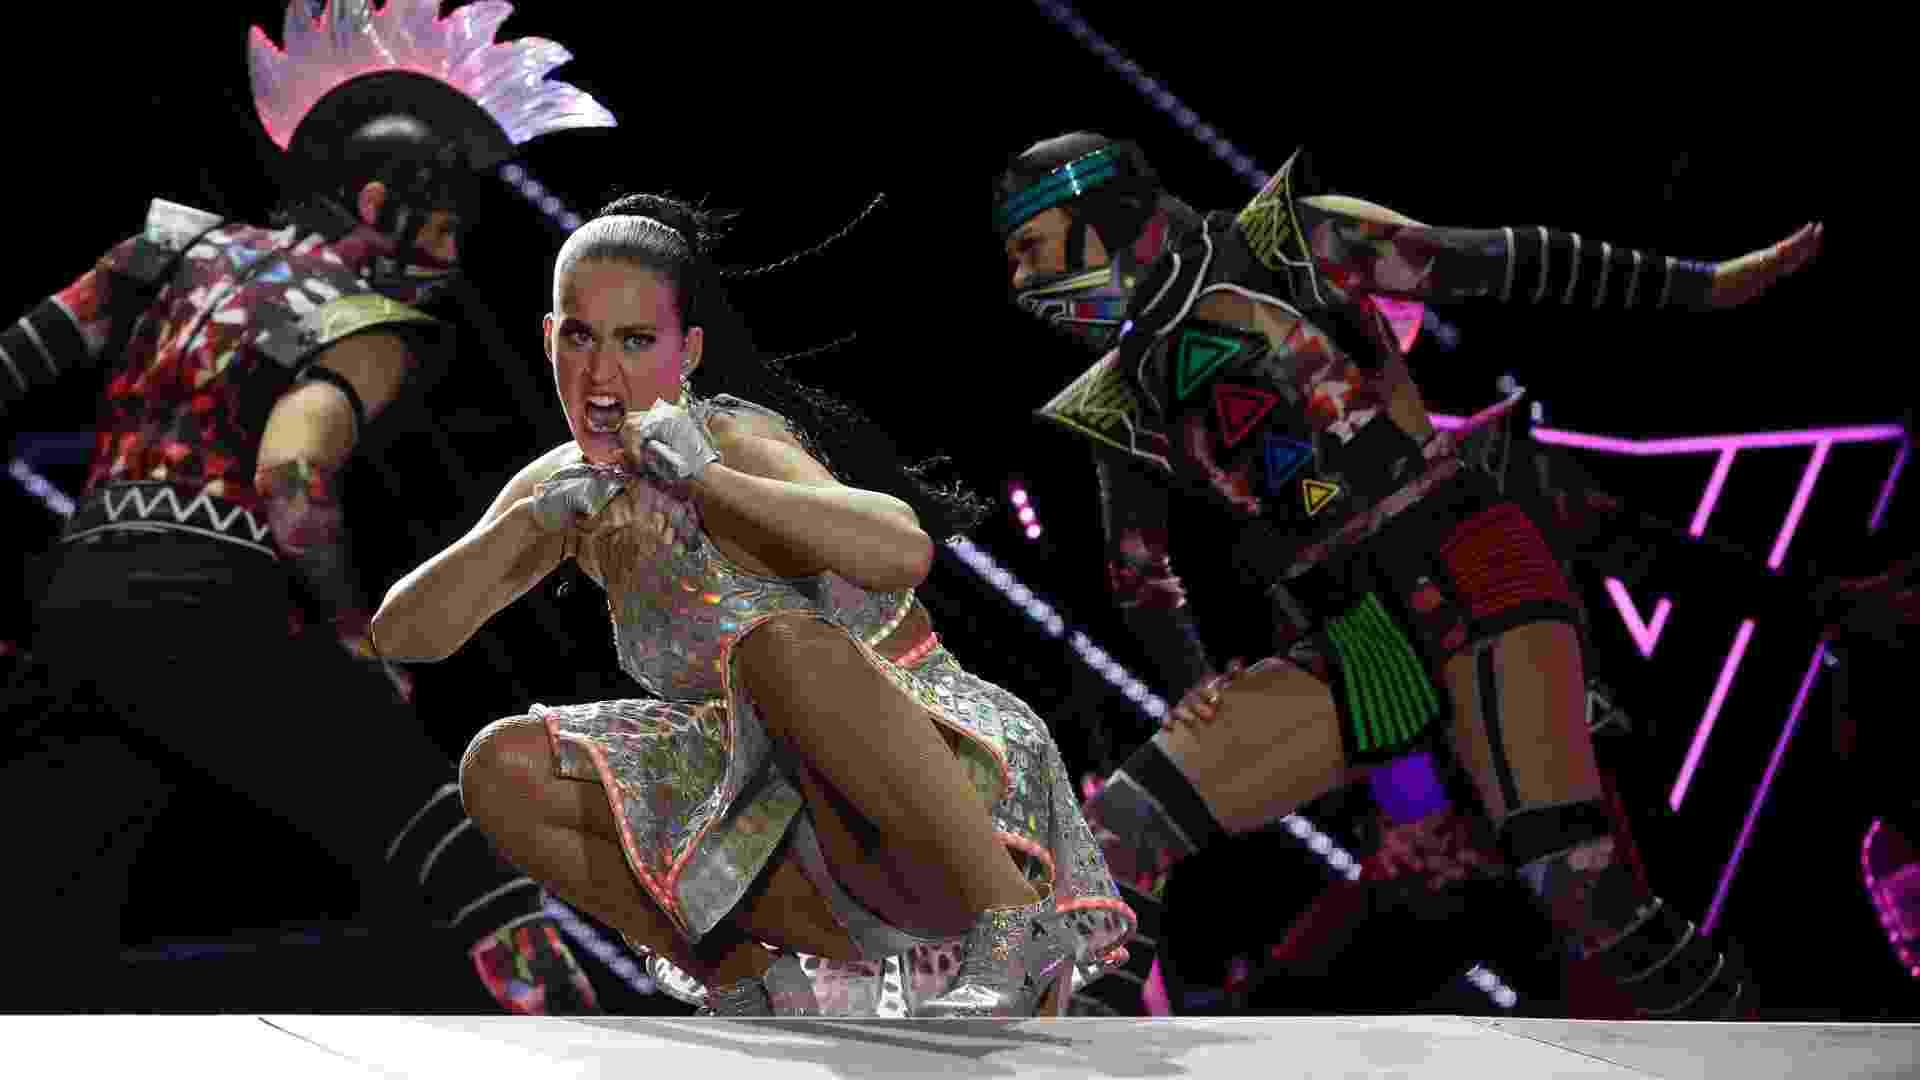 27.set.2015 - Katy Perry faz o último show do palco mundo no último dia do Rock in Rio 2015 - Marco Antonio Teixeira/UOL